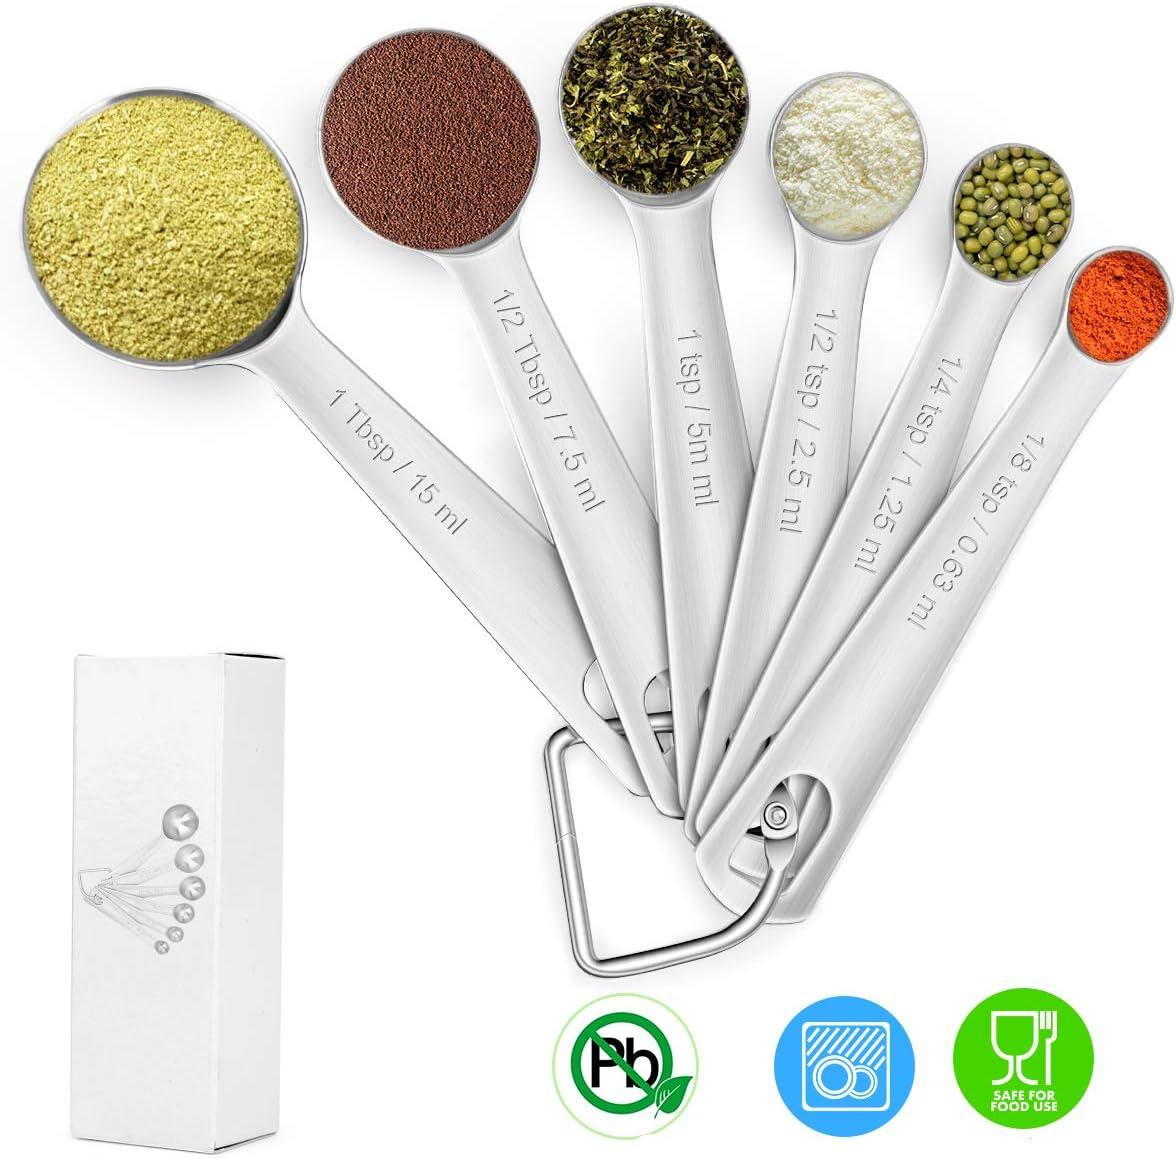 Elokipoe 18/8 Stainless Steel Measuring Spoon, Accurate Measuring Spoons with D-ring, 304 Stainless Steel Measure Spoons for Food, Spice, Jar, Milk, Dry or Liquid, Measure Spoons Set, Dishwasher Safe